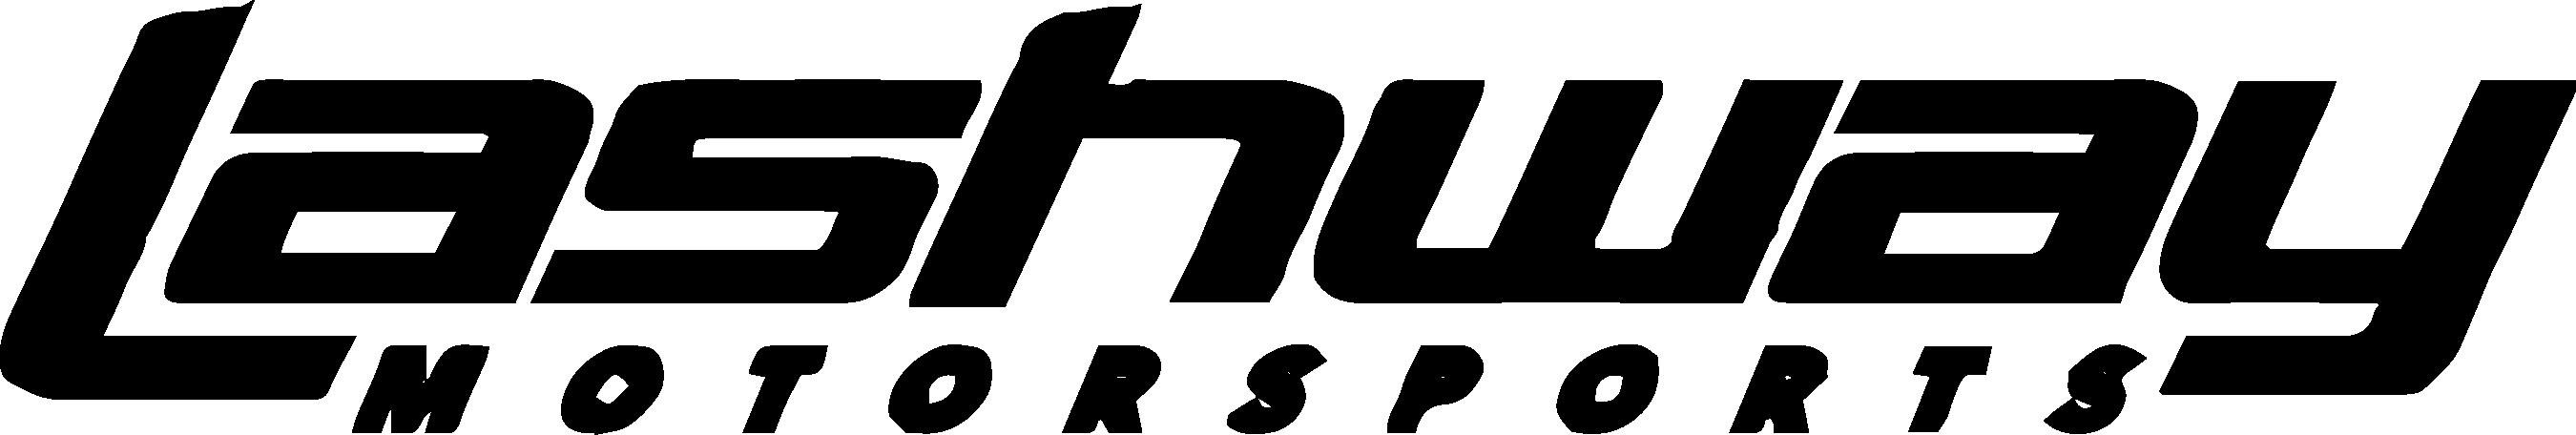 lashway_logo_black